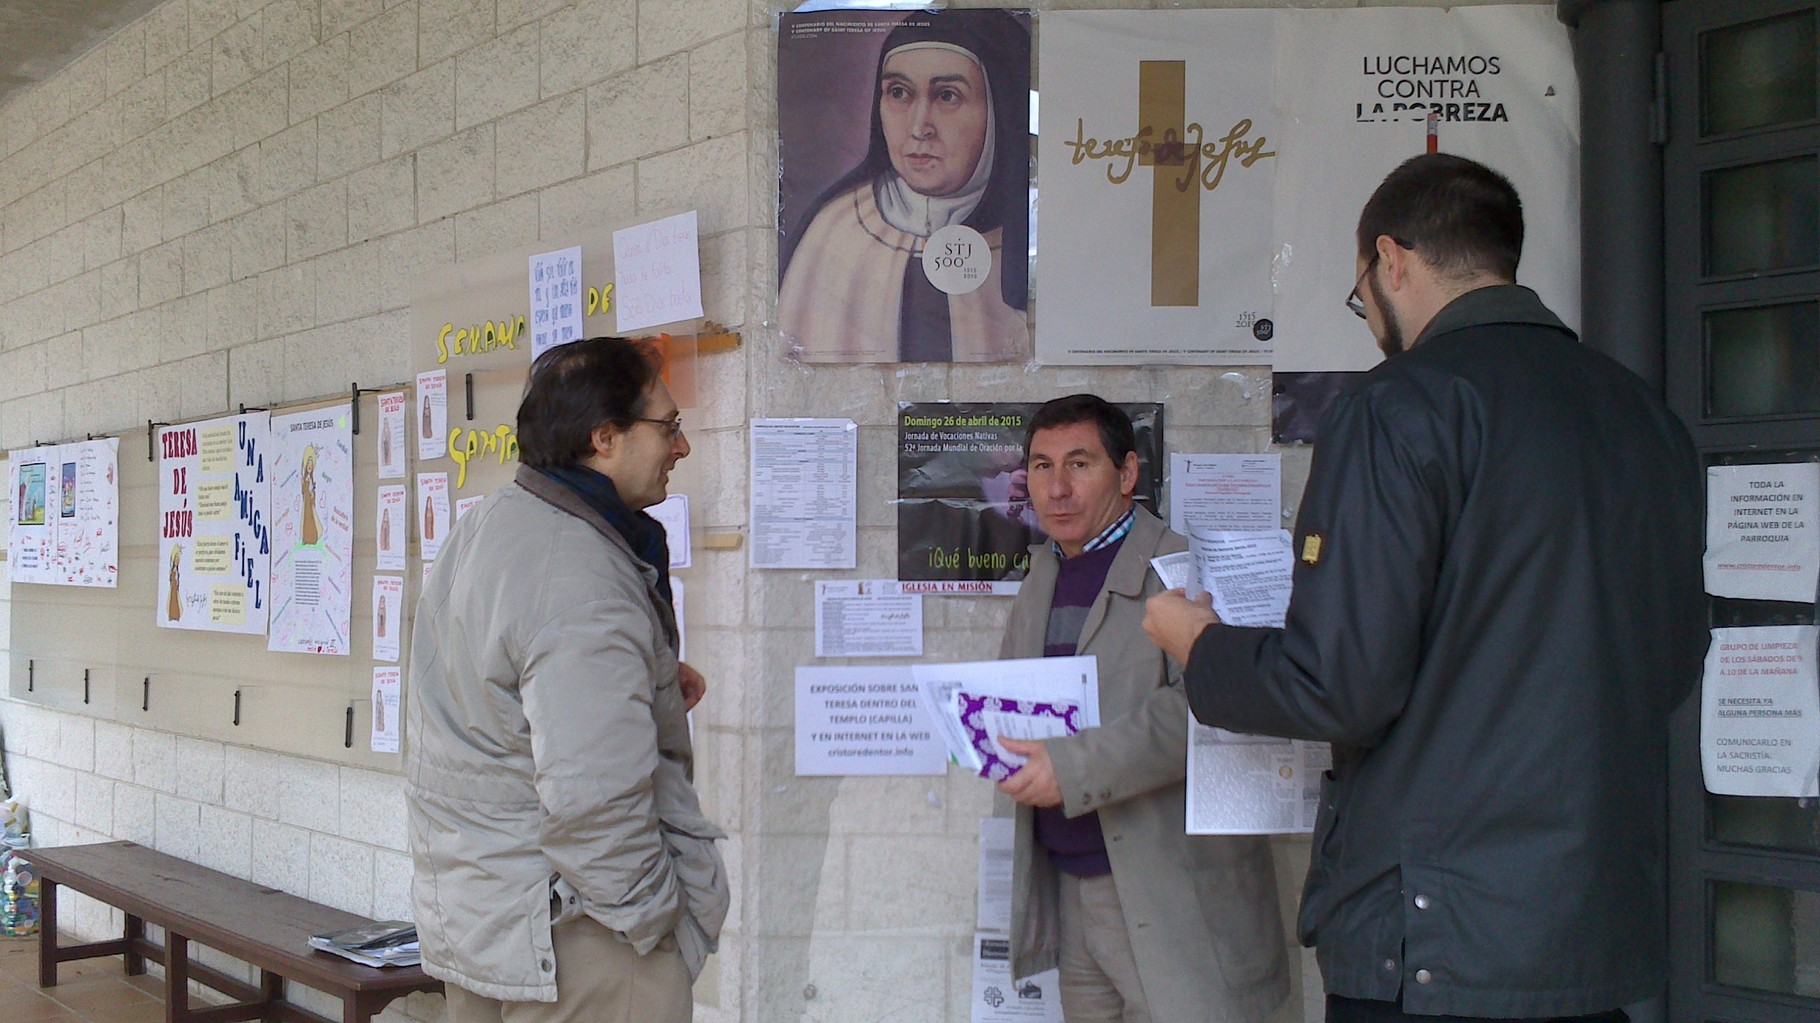 Exposición de Santa Teresa en nuestra parroquia (Semana de Santa Teresa del 18 al 26 de abril)